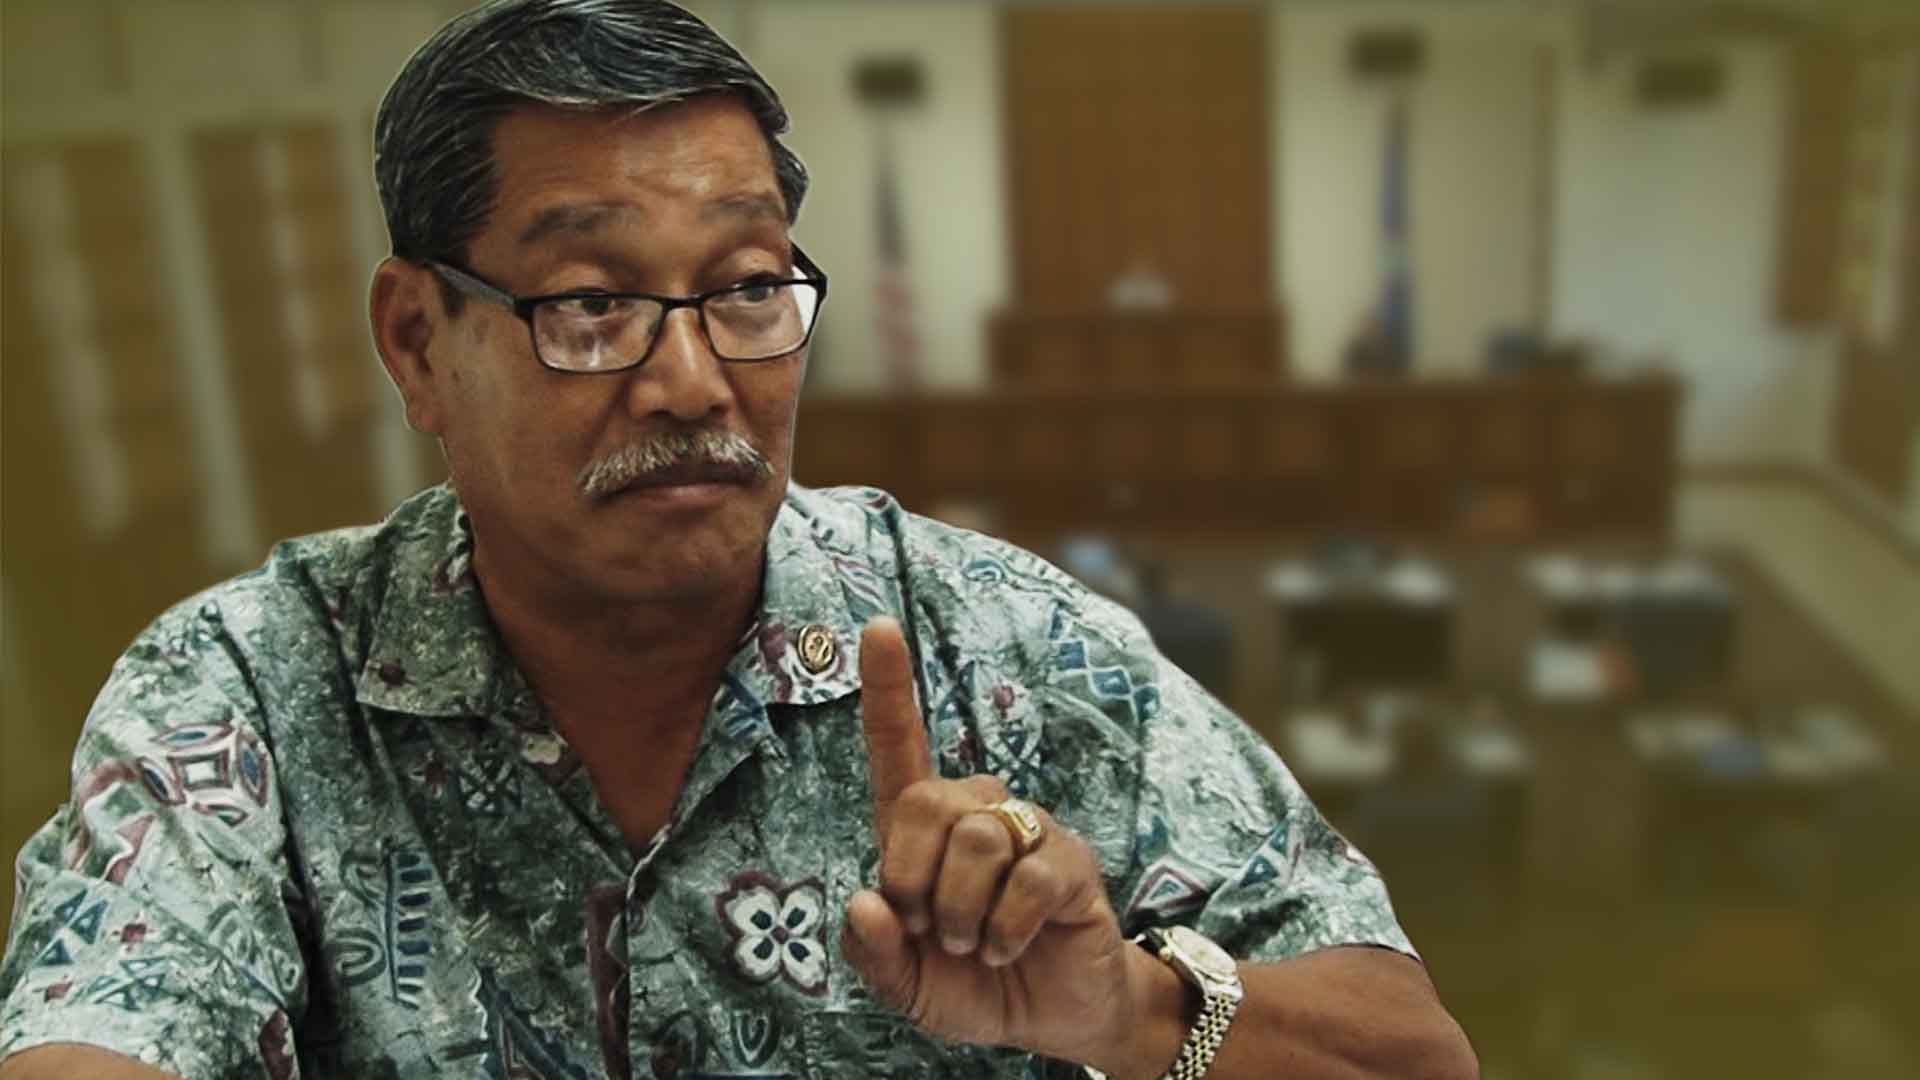 Legislation wants to increase Guam's minimum wage   PNC News First